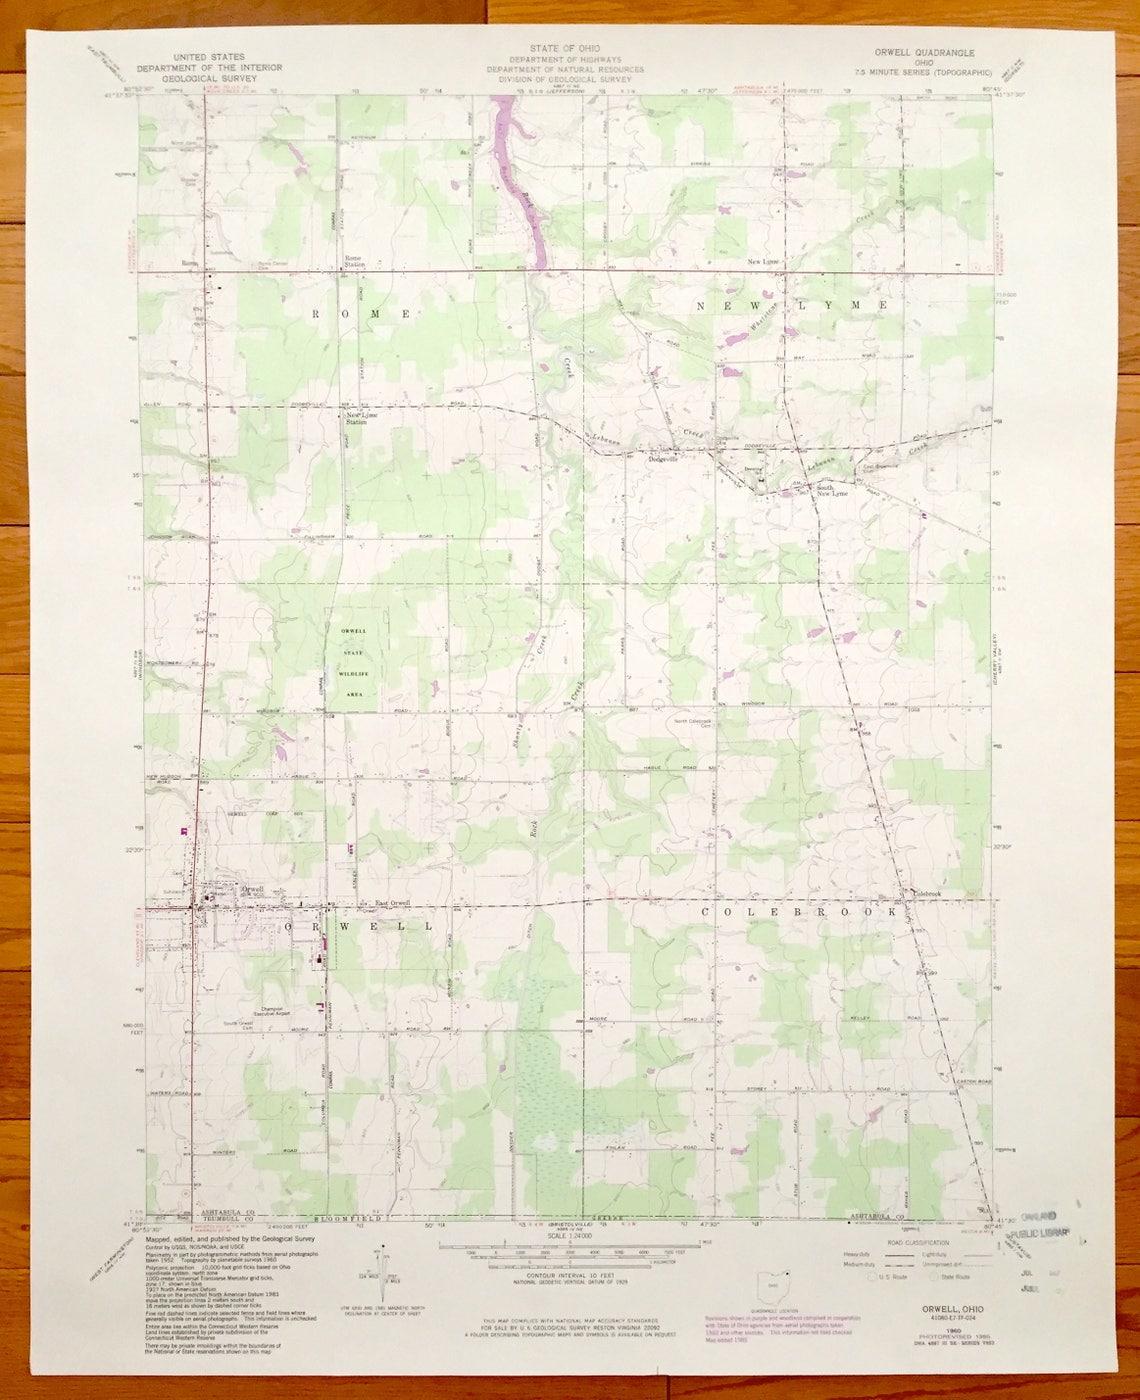 Orwell Ohio Map.Antique Orwell Ohio 1960 Us Geological Survey Topographic Map Etsy